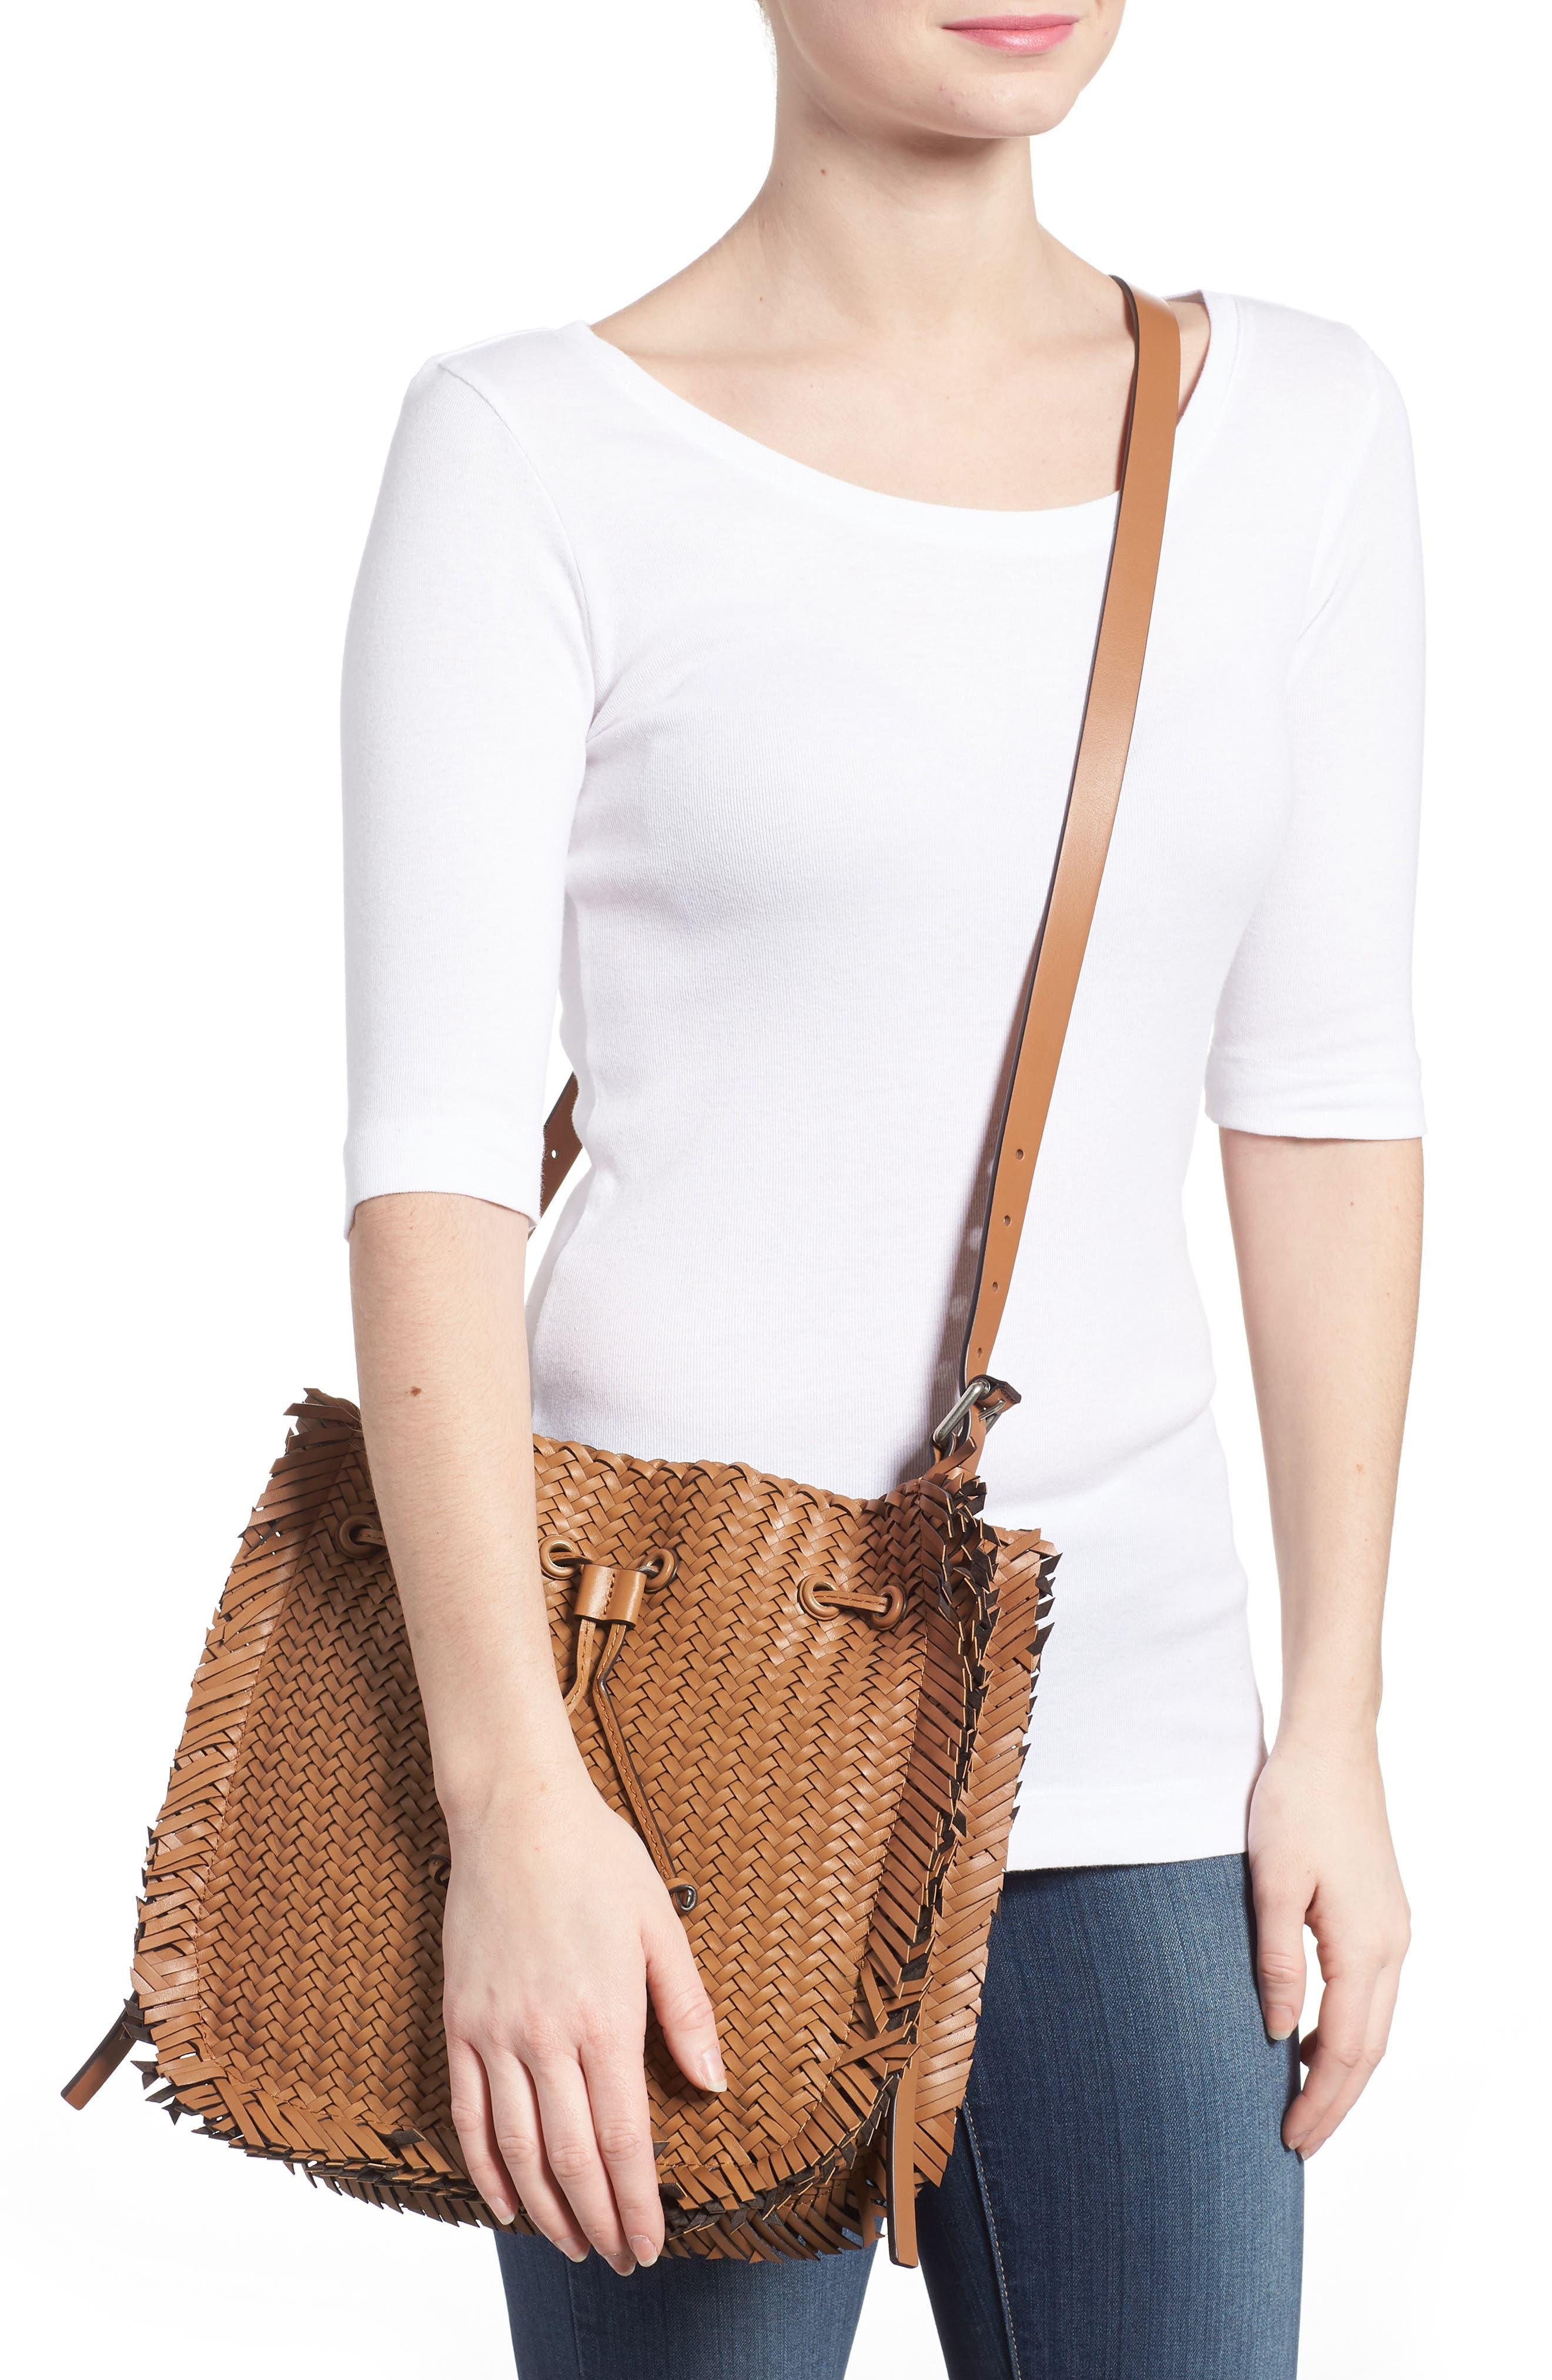 Maldives Woven Frayed Leather Crossbody Bag,                             Alternate thumbnail 2, color,                             231